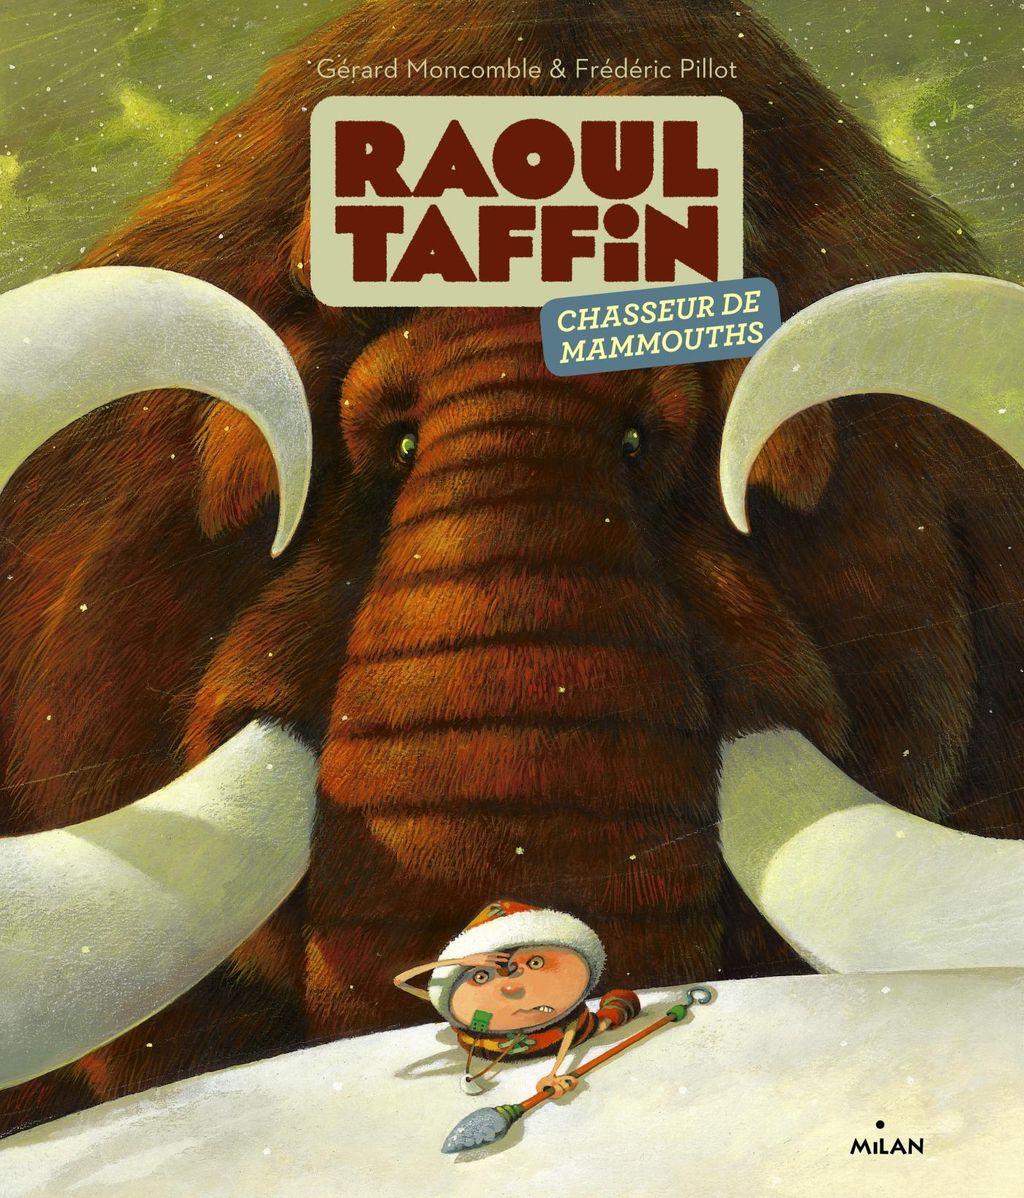 «Raoul Taffin chasseur de mammouths» cover